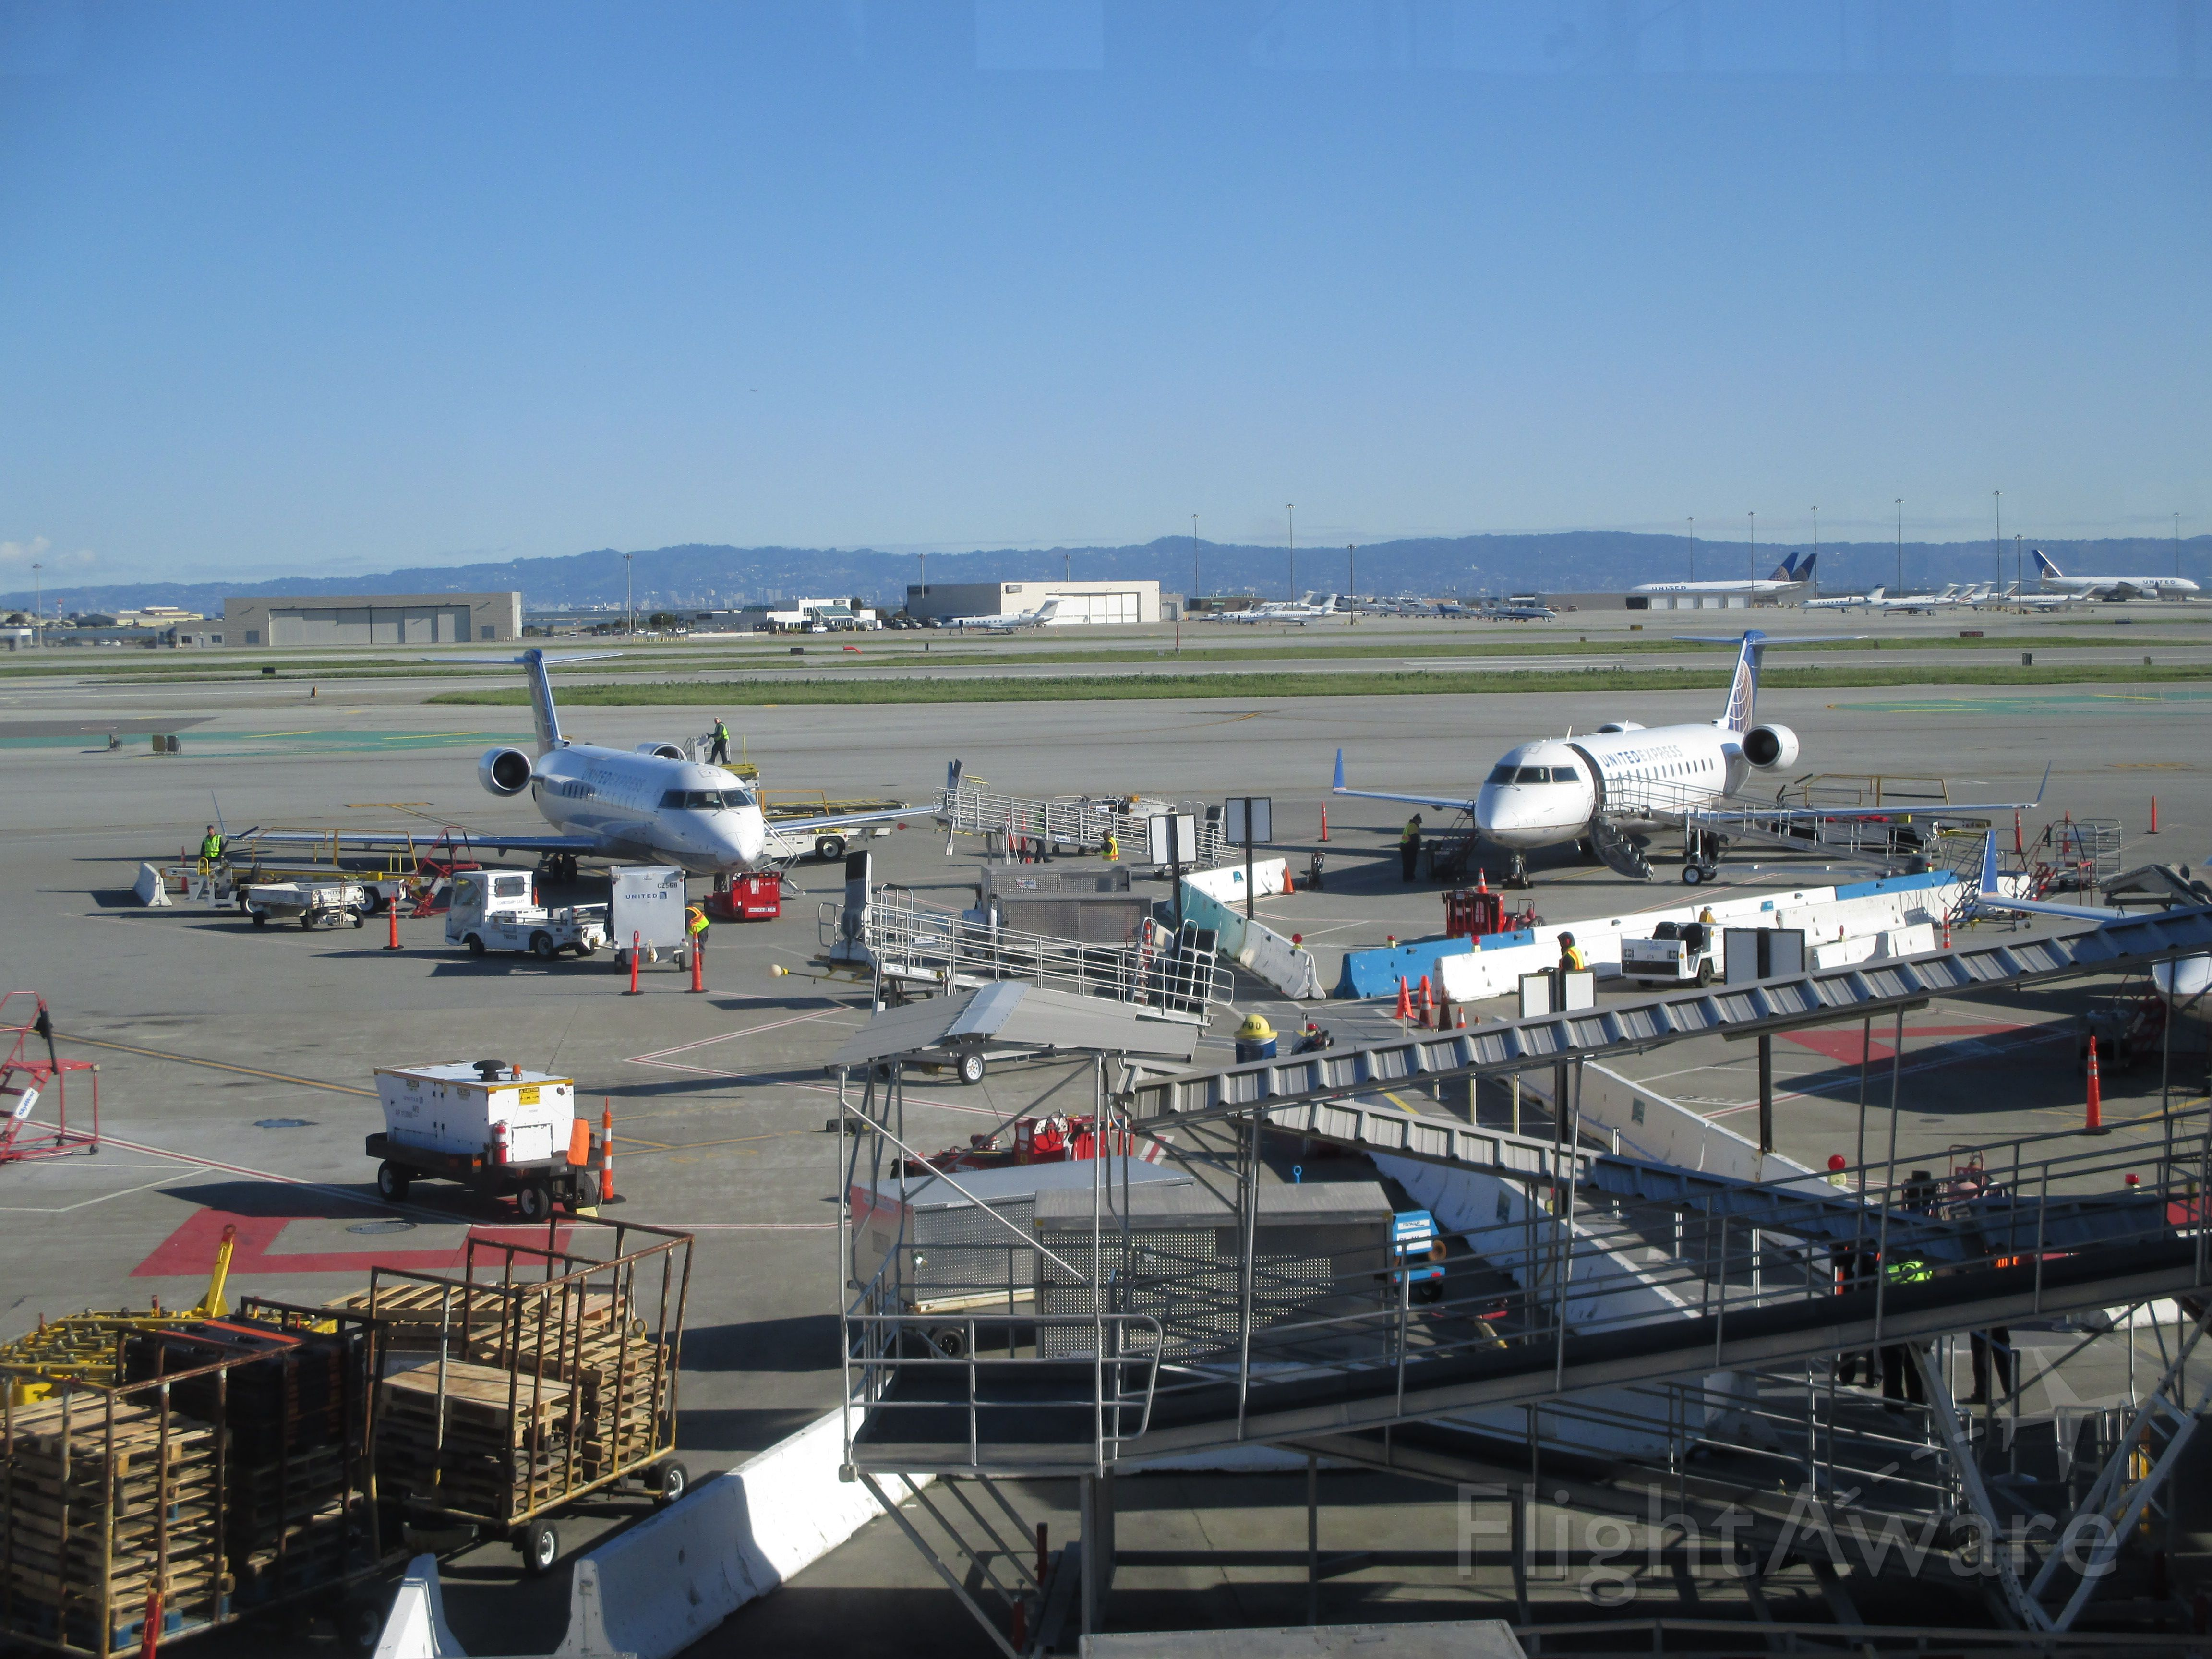 Canadair Regional Jet CRJ-200 — - Waiting to board my flight to Ontario.